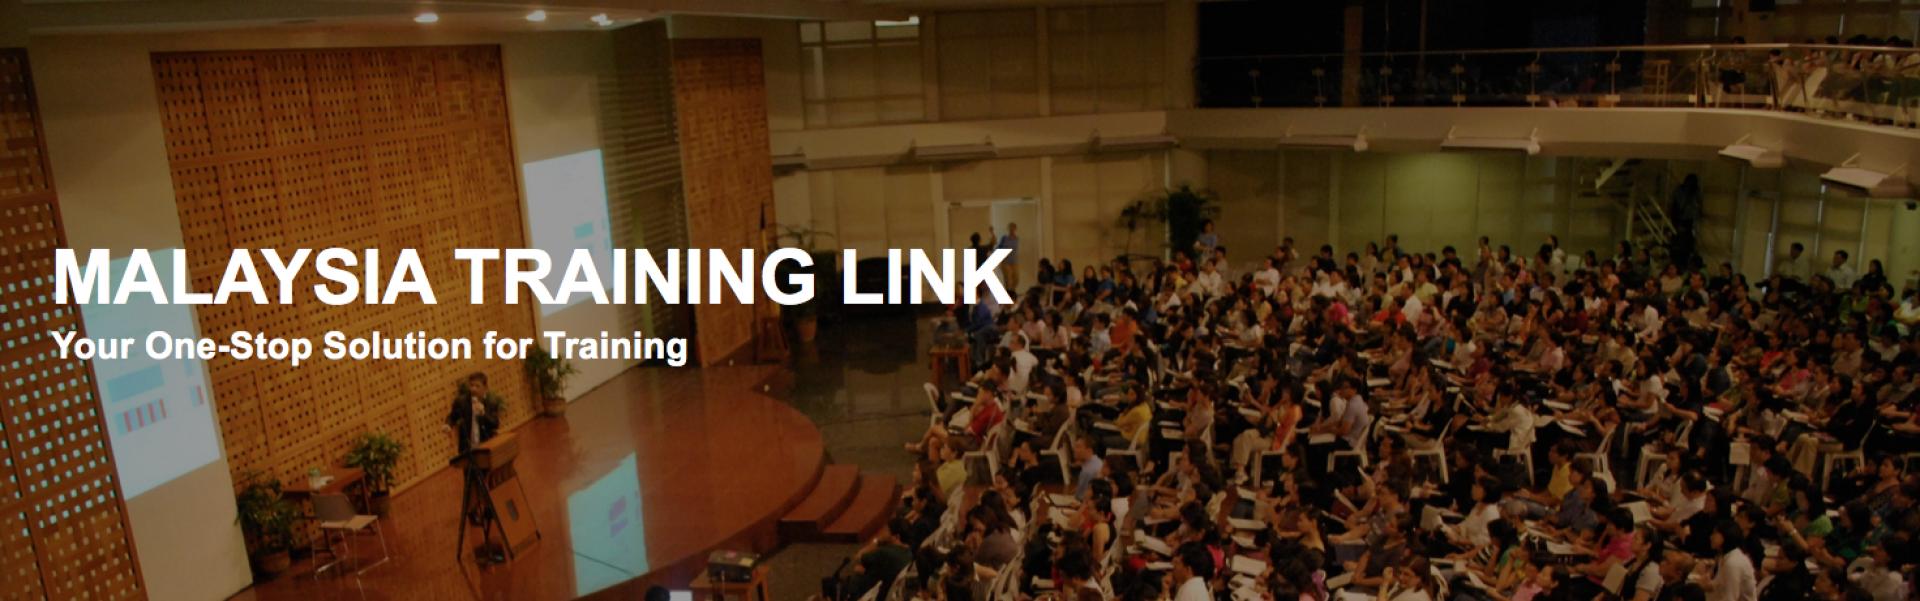 Malaysia Training Link